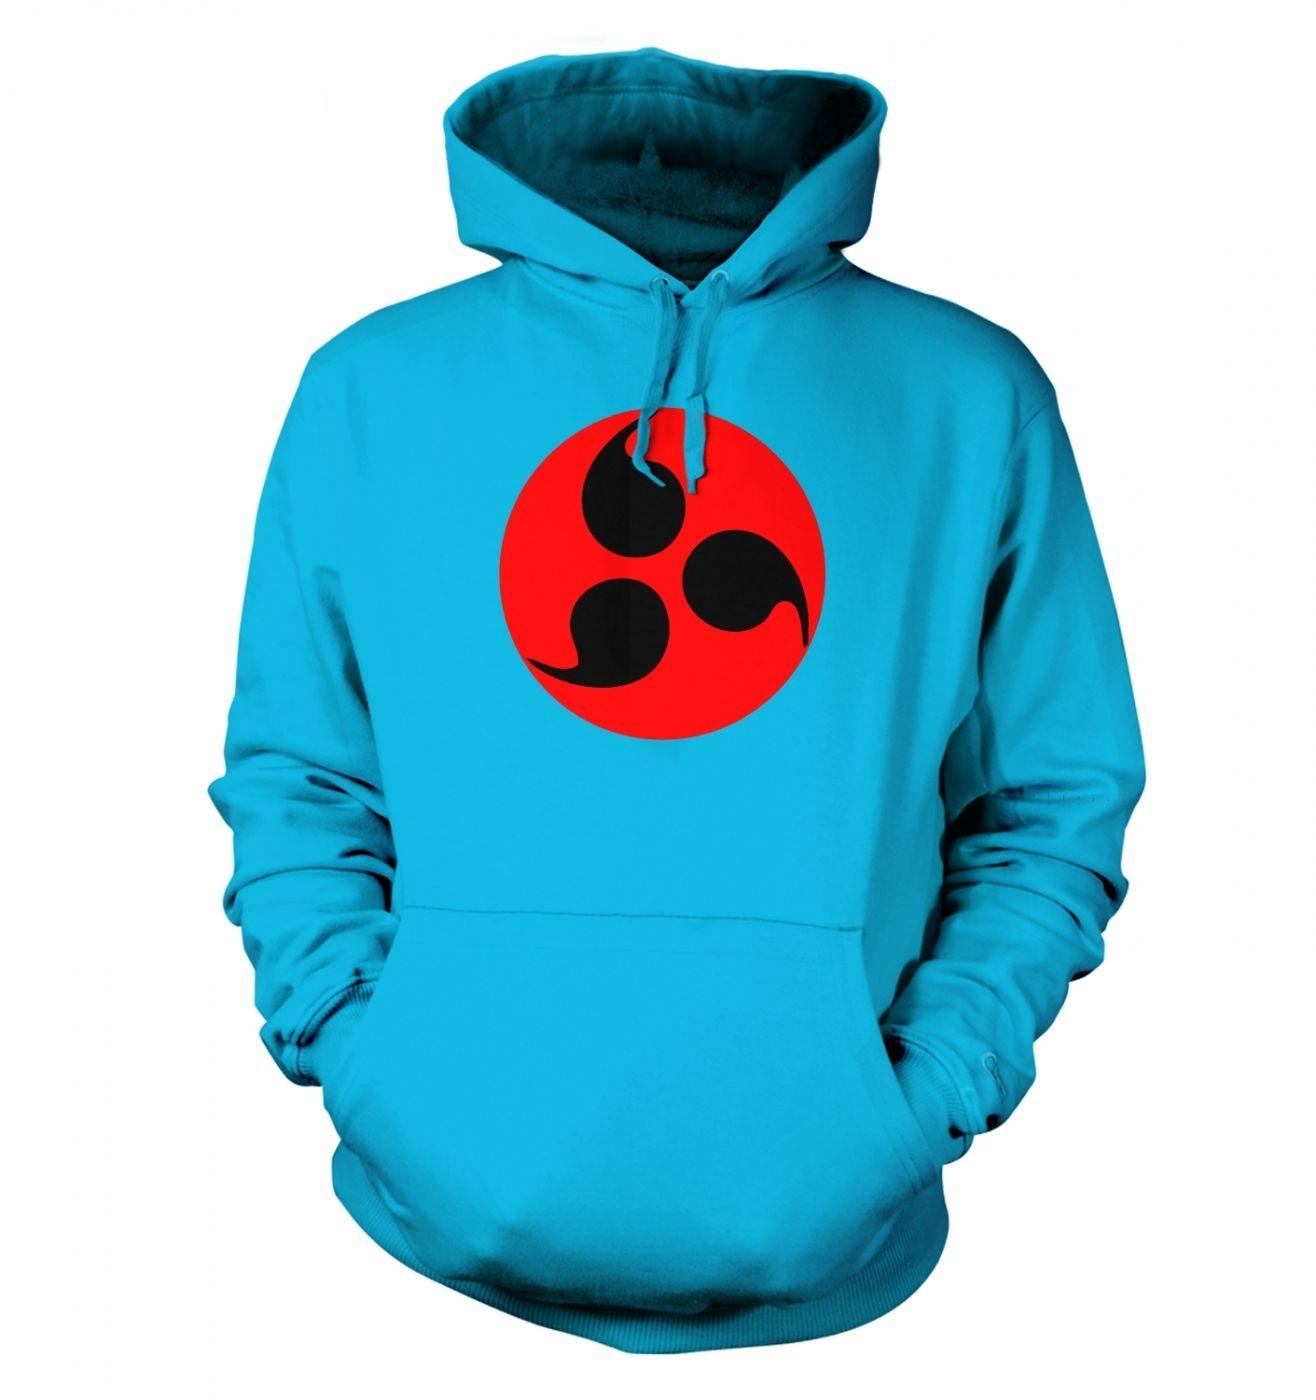 Sharingan Eye hoodie